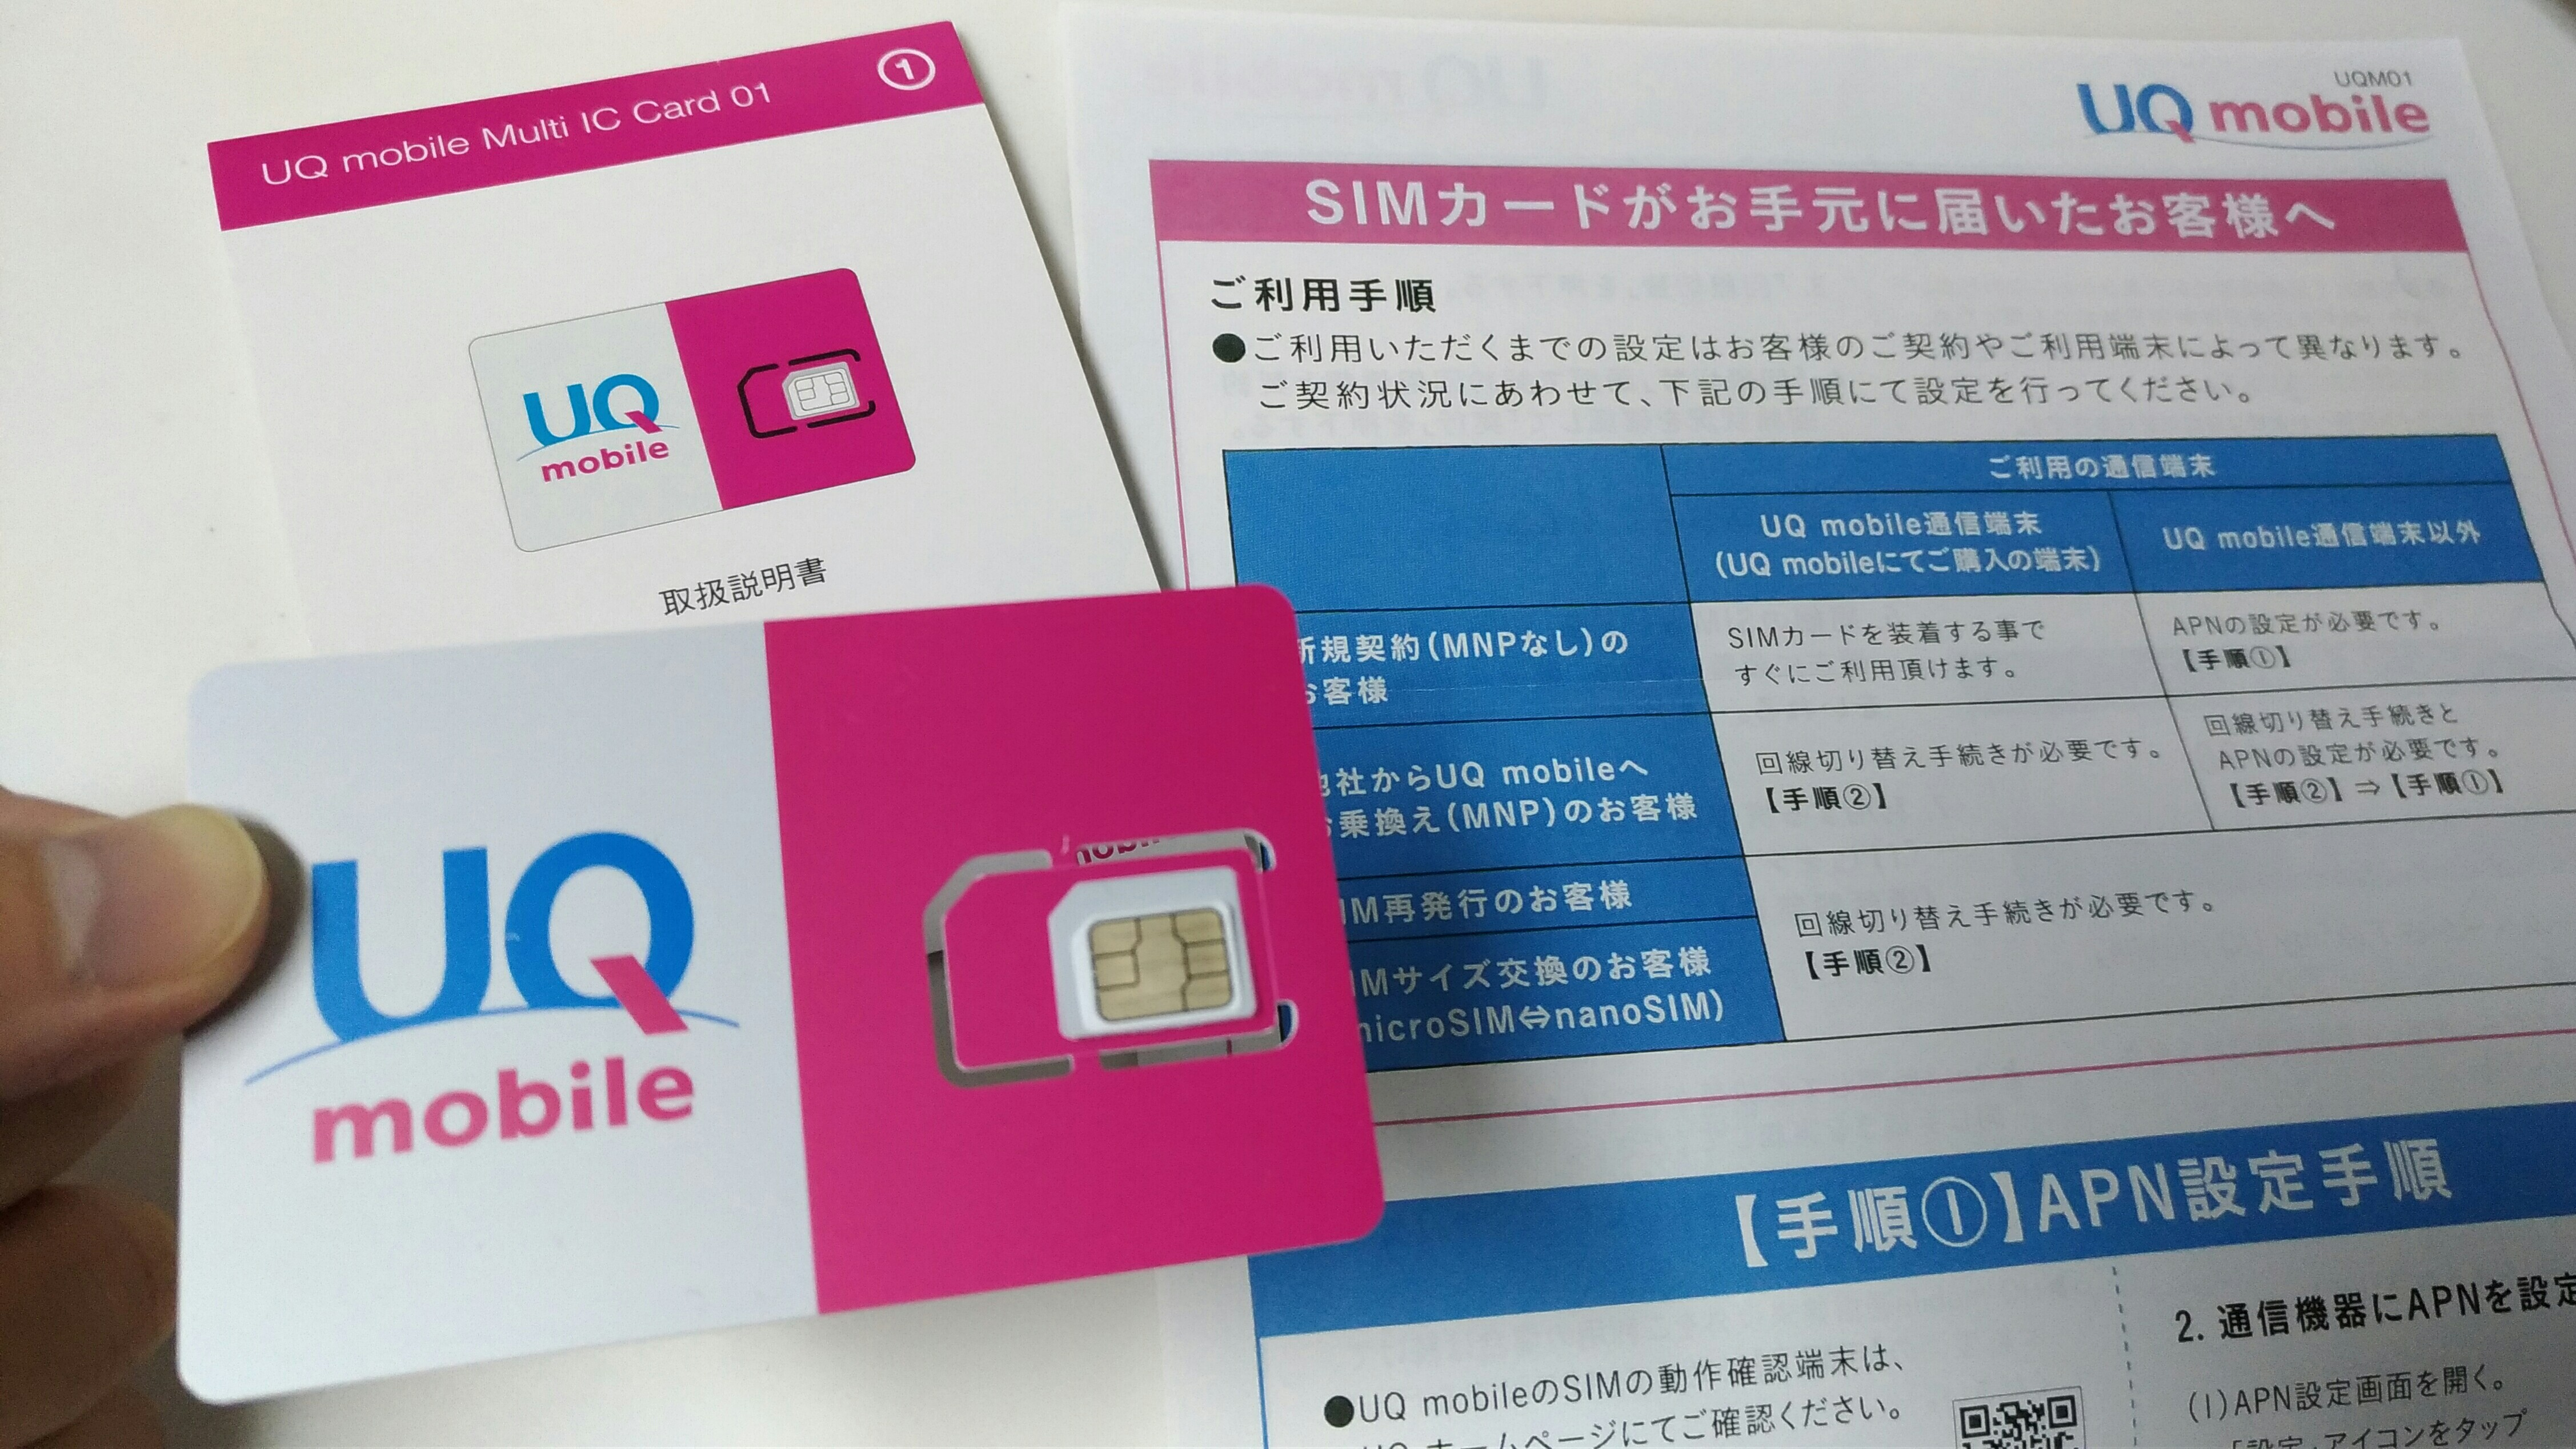 UQ mobile(利用料金・オプション)